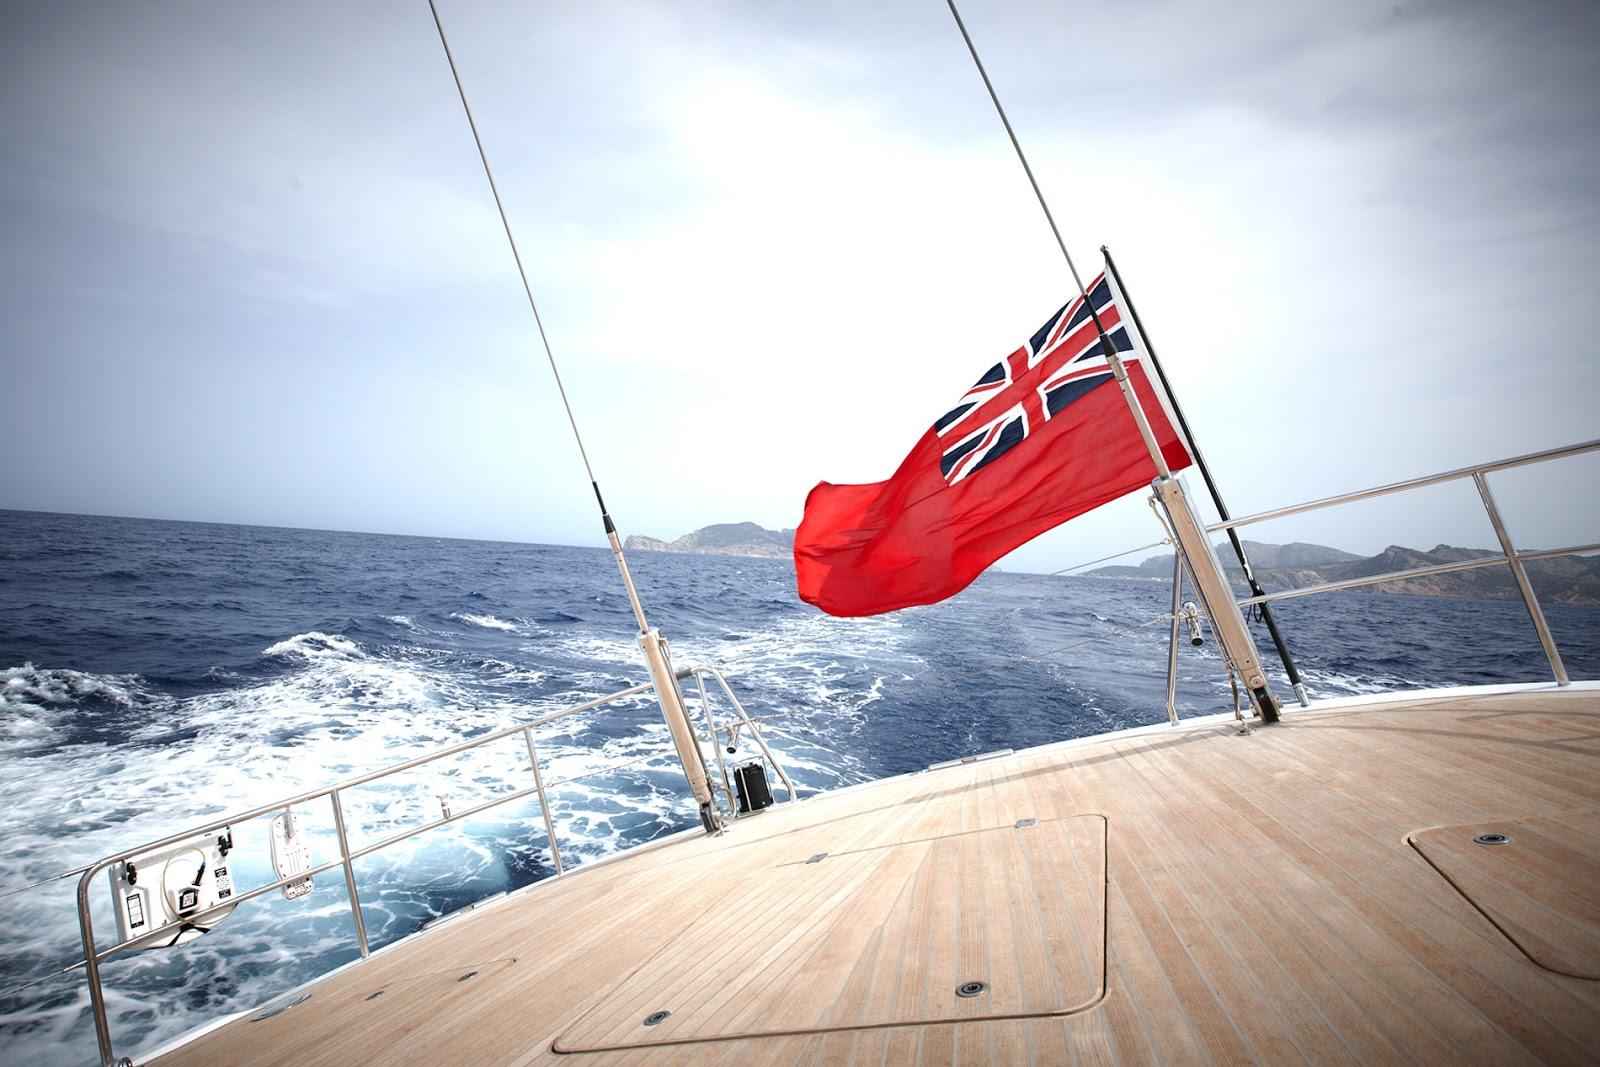 alquiler de veleros en ibiza. alquiler veleros ibiza. alquiler de veleros en ibiza. alquiler veleros ibiza. alquilar veleros en ibiza. barcos de alquiler en ibiza